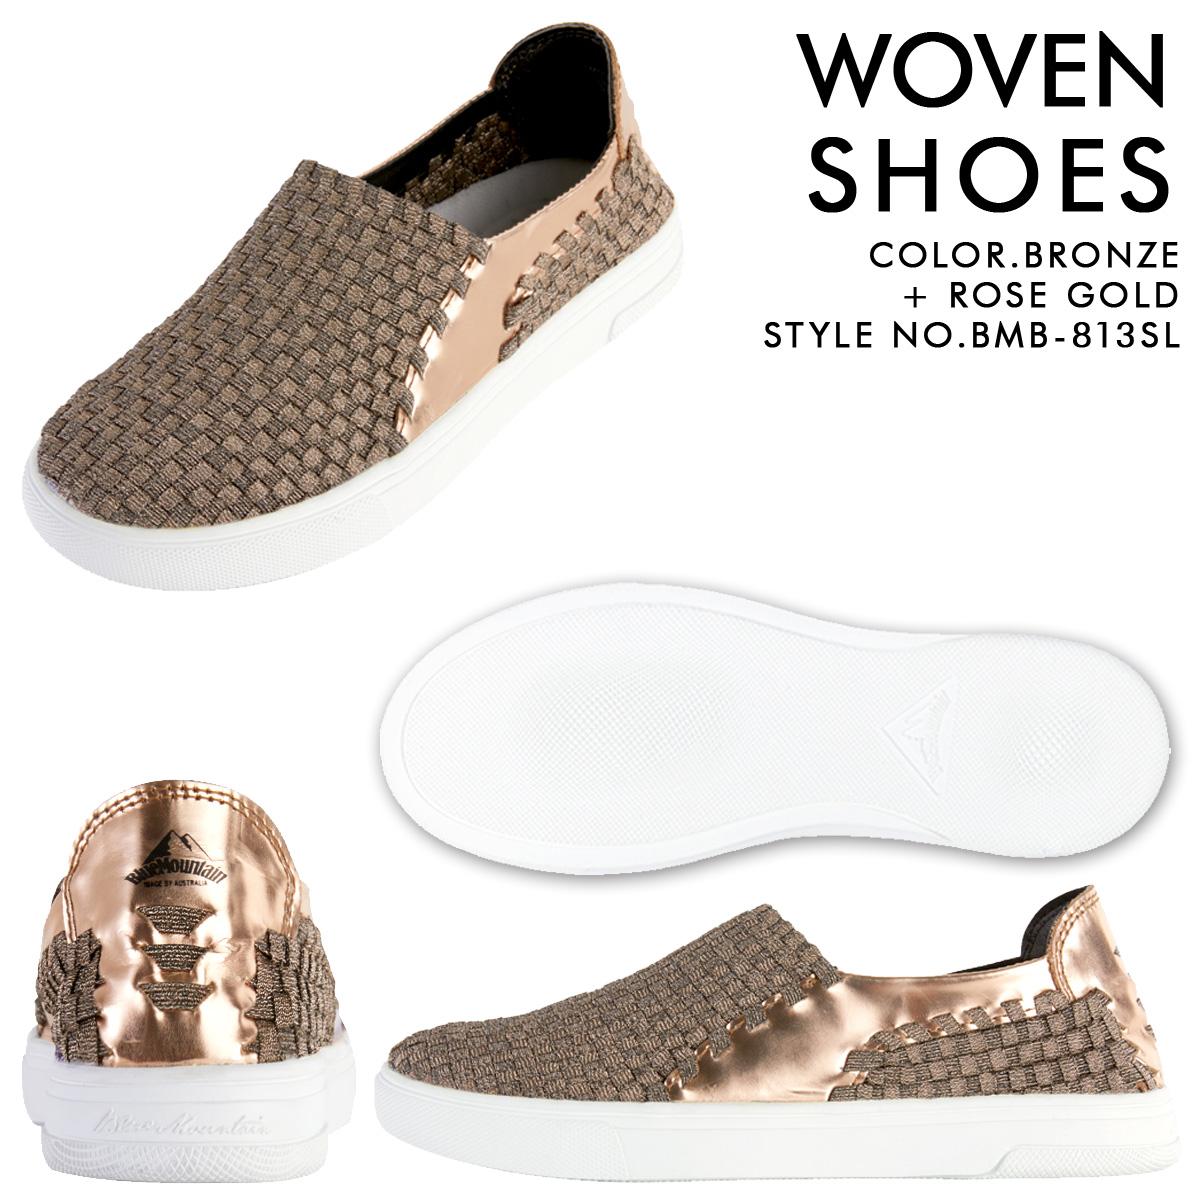 9e497ed5e9 BLUE MOUNTAIN Blue Mountain sandals Lady s slip-ons sneakers WOVEN SLIP-ON  BMB-813SL BMB-814SL shoes gold silver